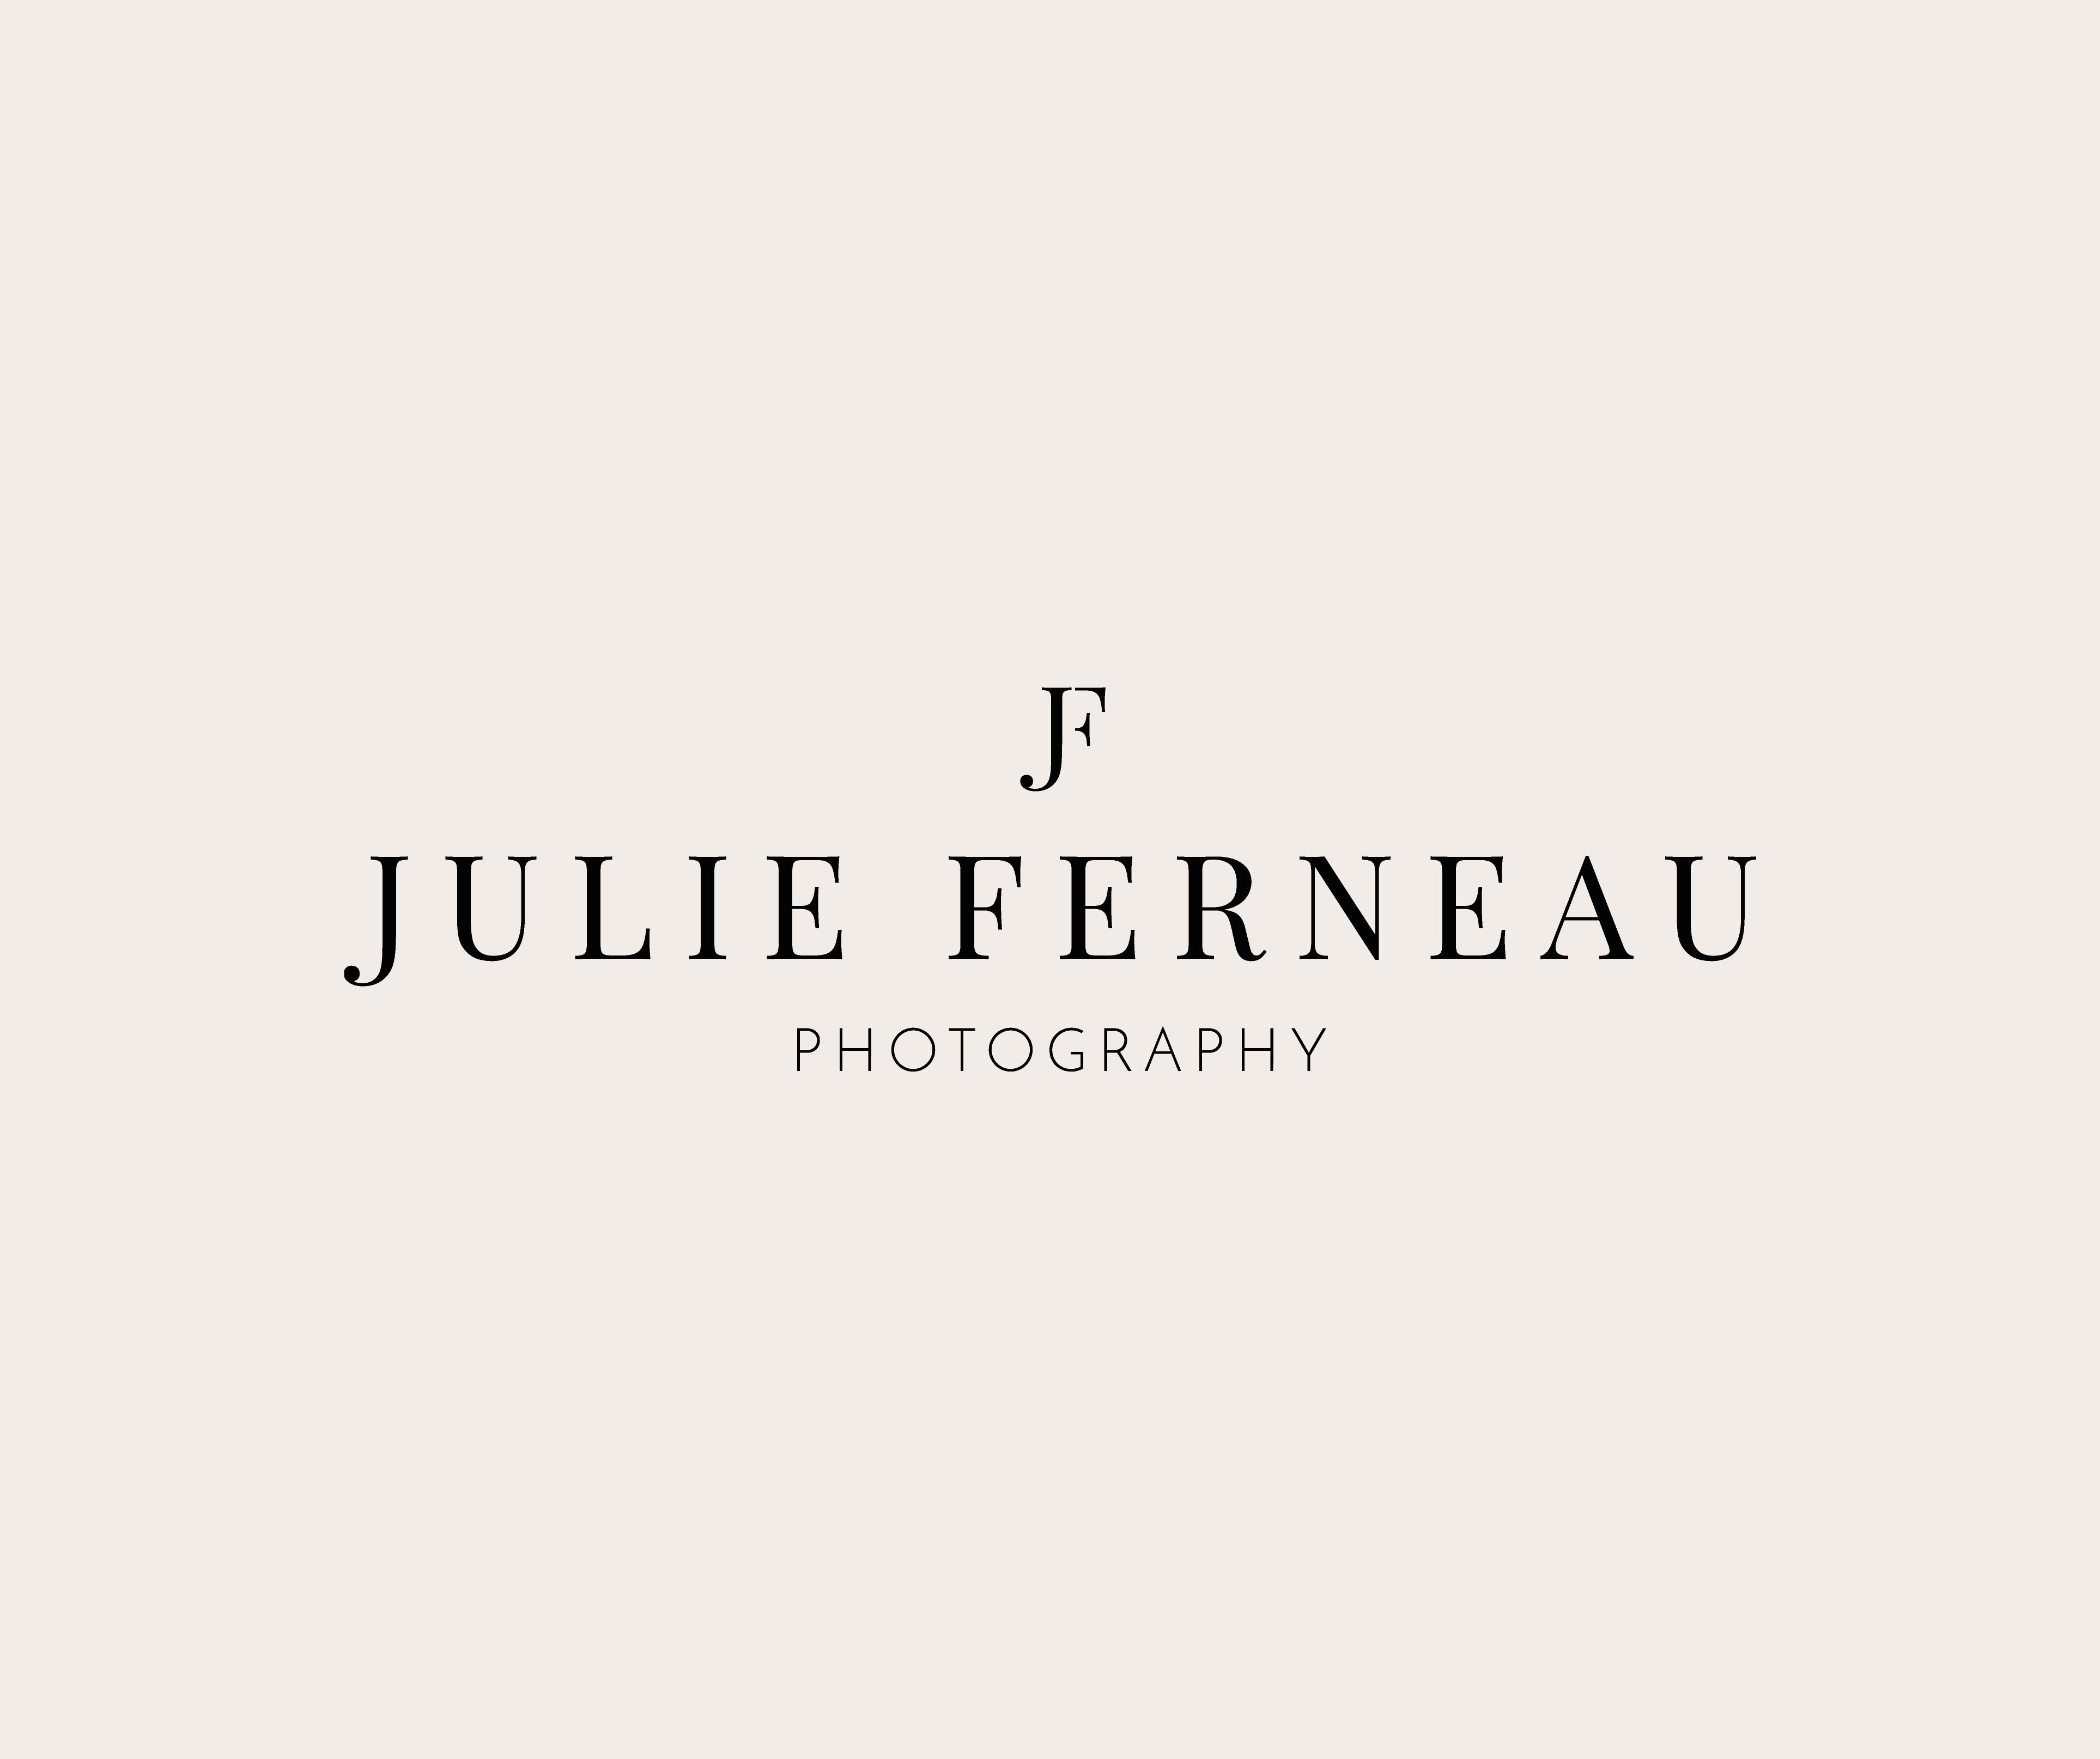 Julie Ferneau Photography Logo DesignPhotography